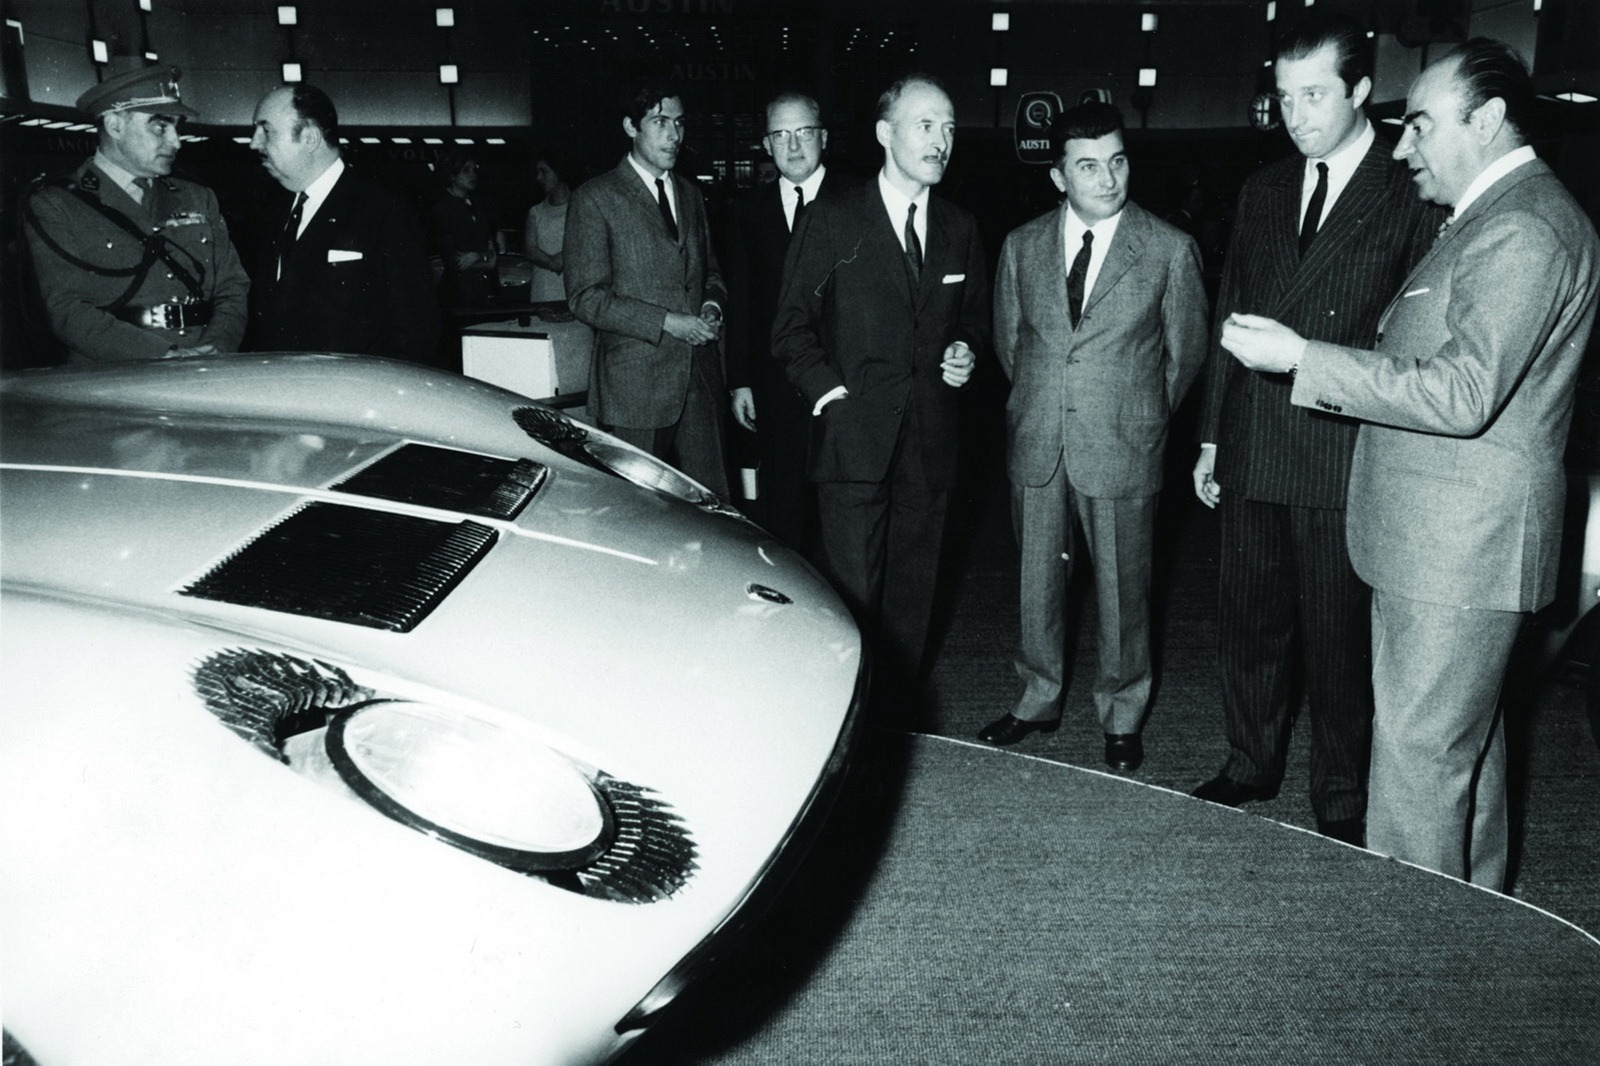 Antonio Banderas And Alec Baldwin To Play Lamborghini And